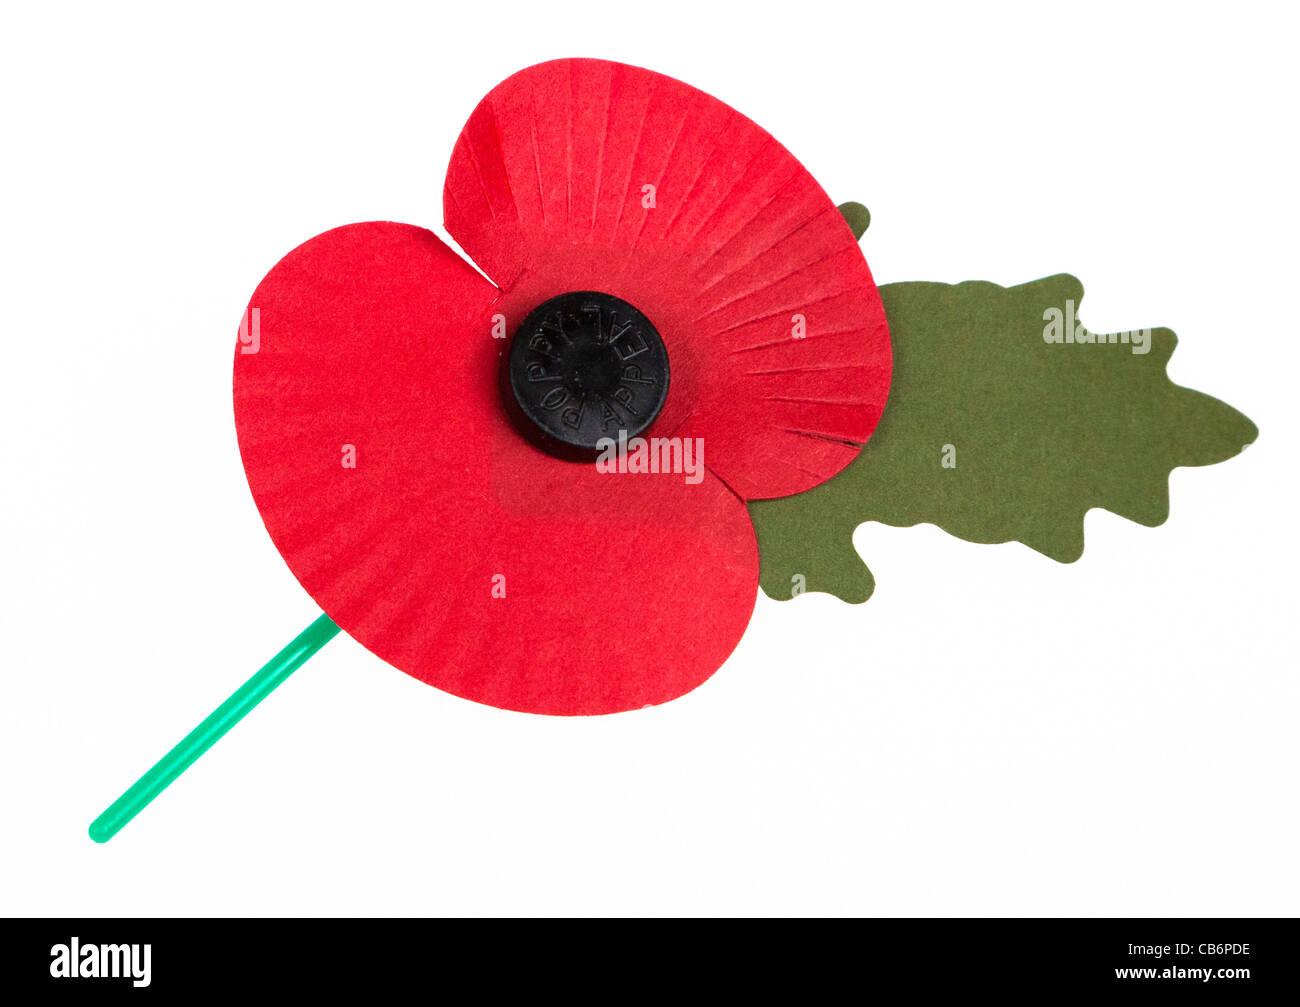 remembrance day poppy stock photos u0026 remembrance day poppy stock